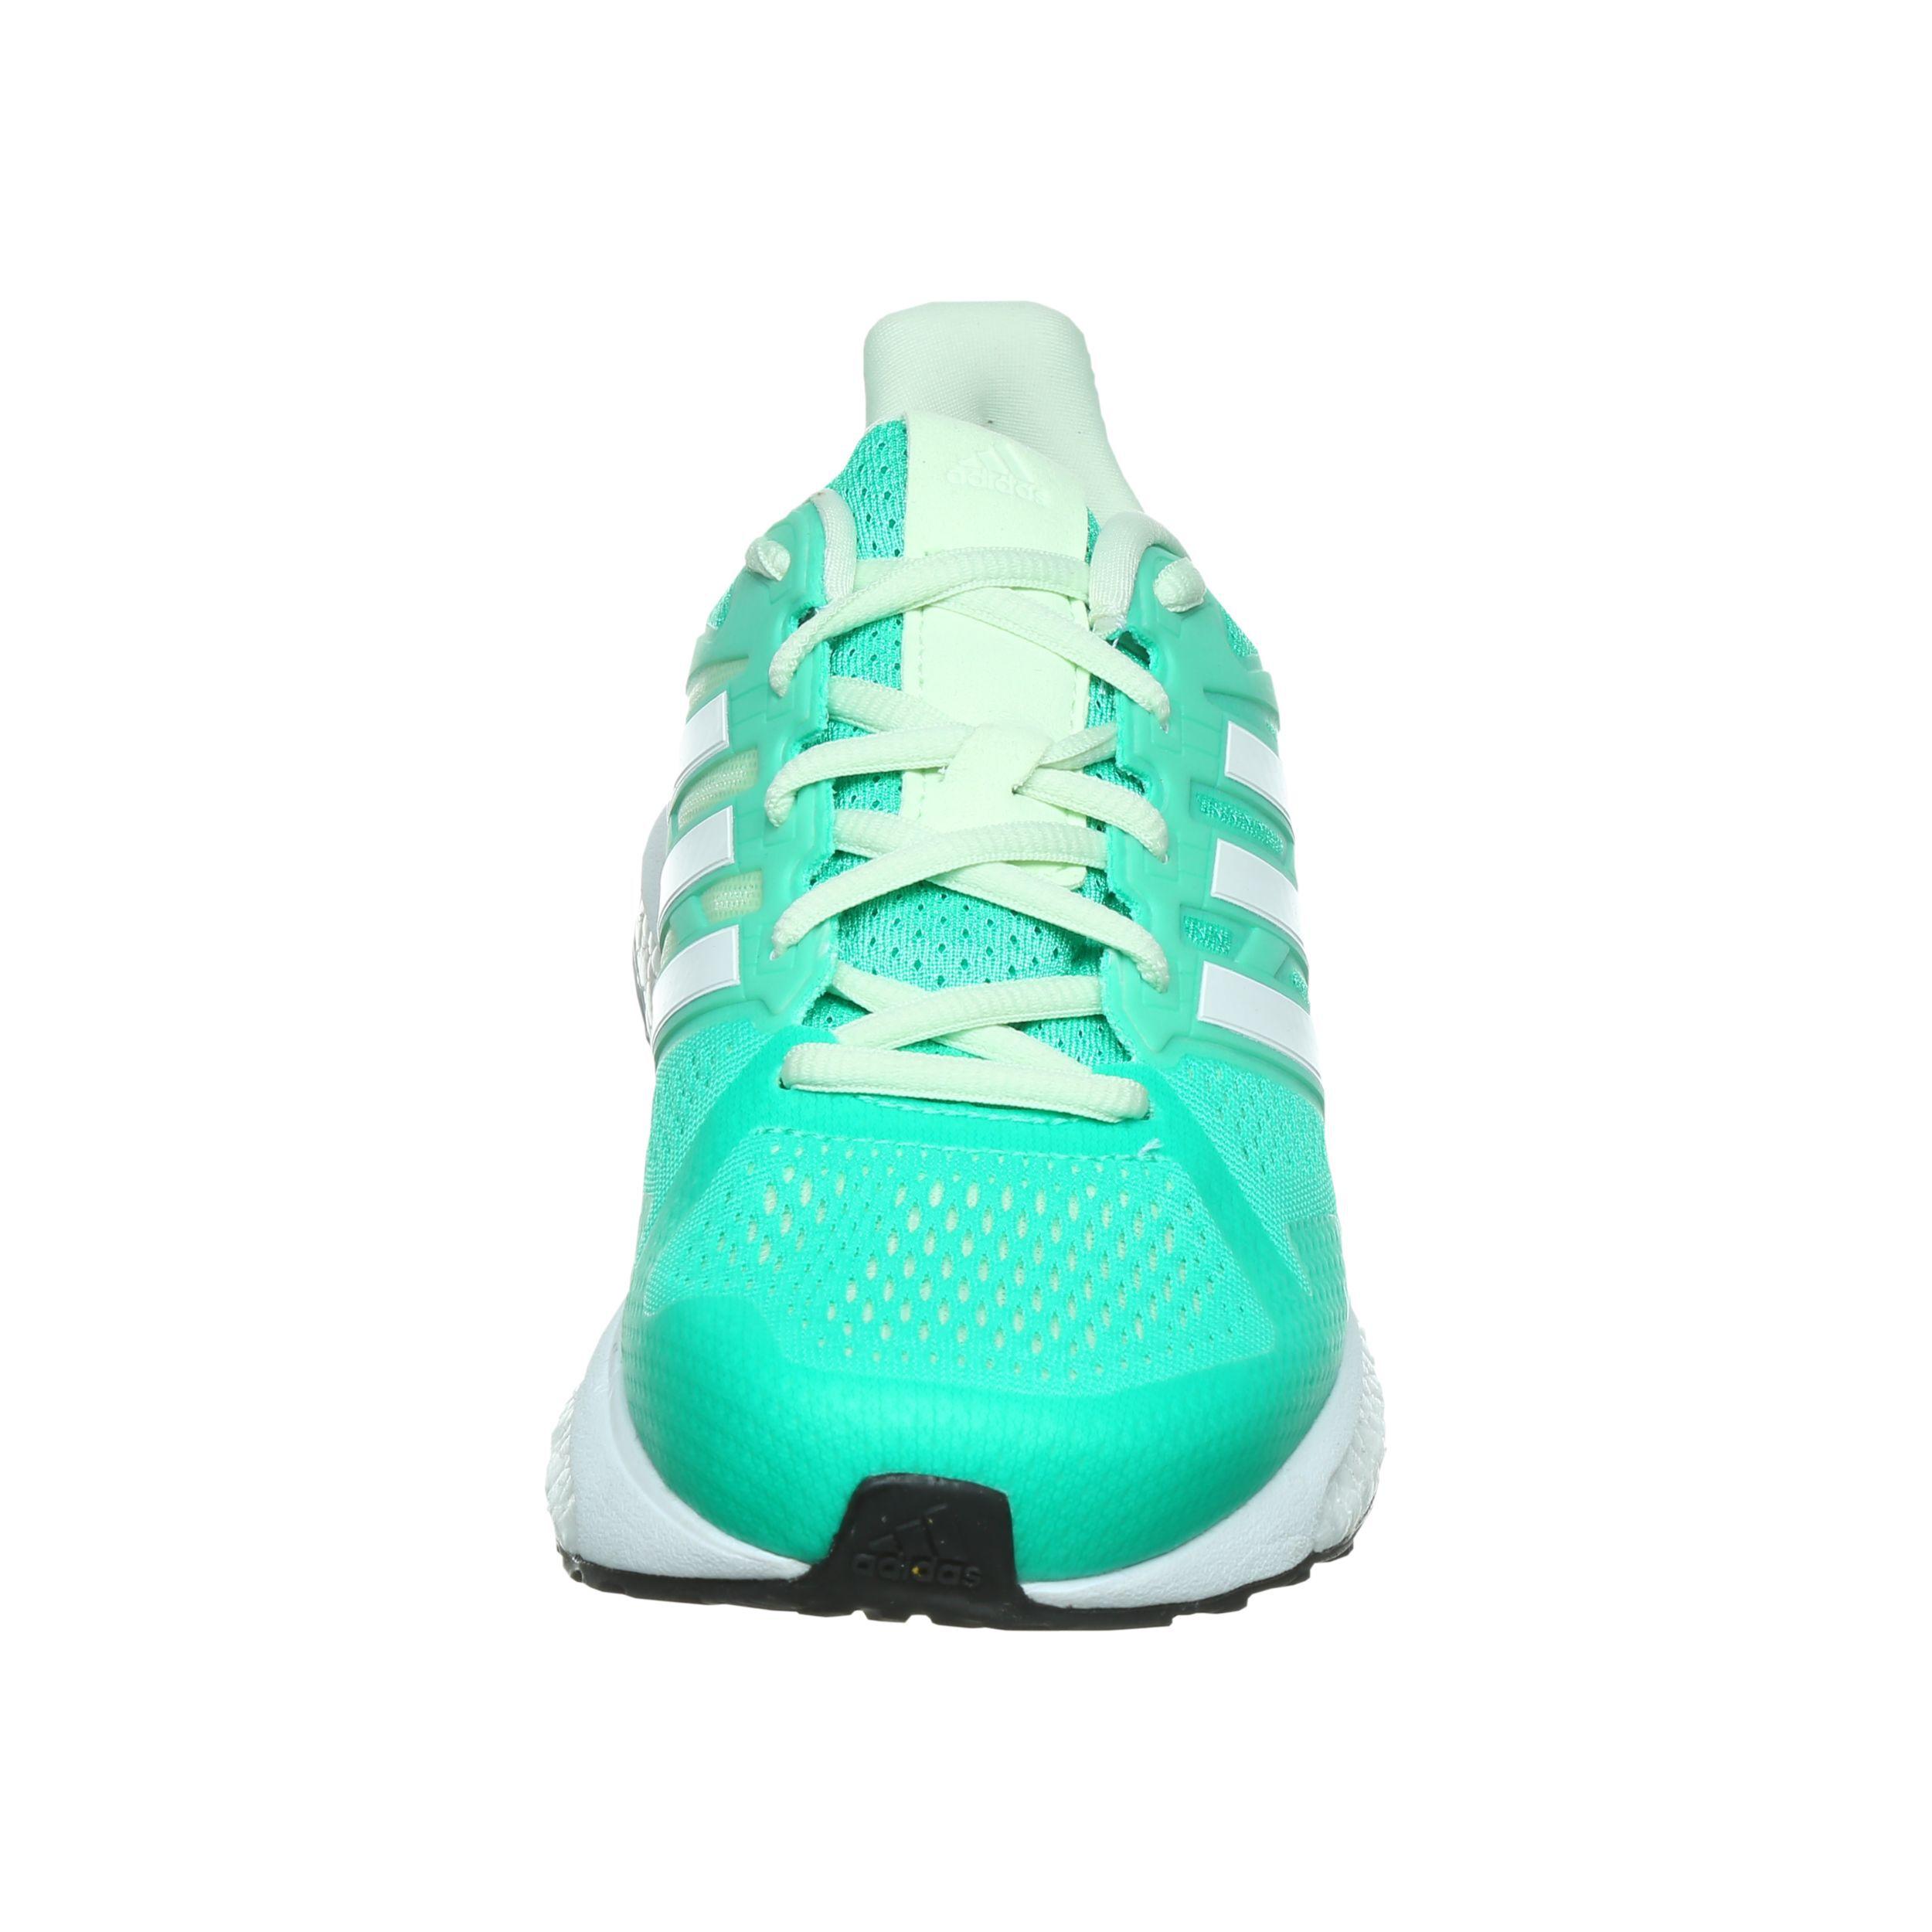 adidas Supernova ST Stability Running Shoe Women Mint, White